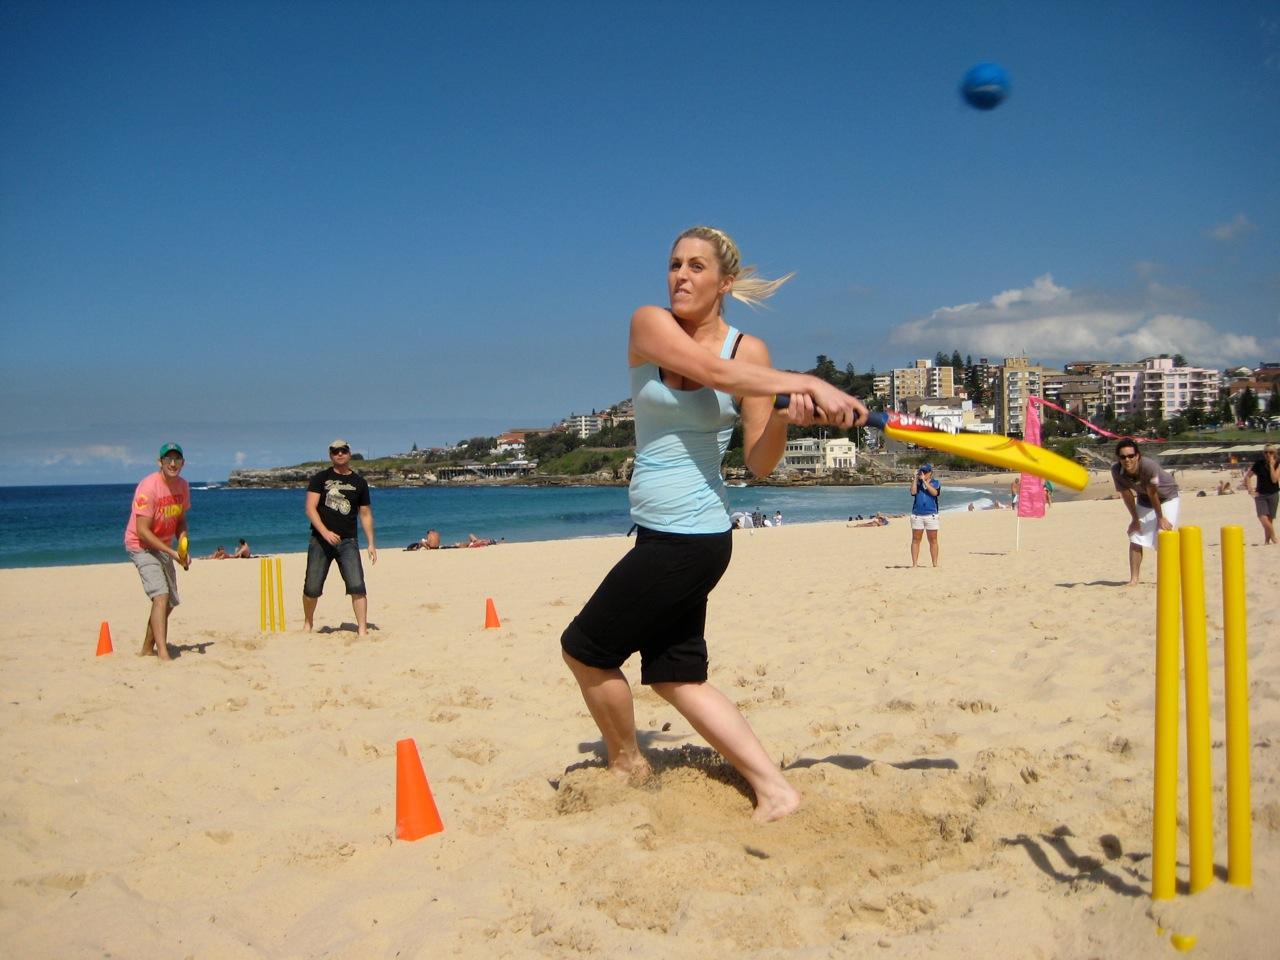 Beach Amazing Race- Team Building: